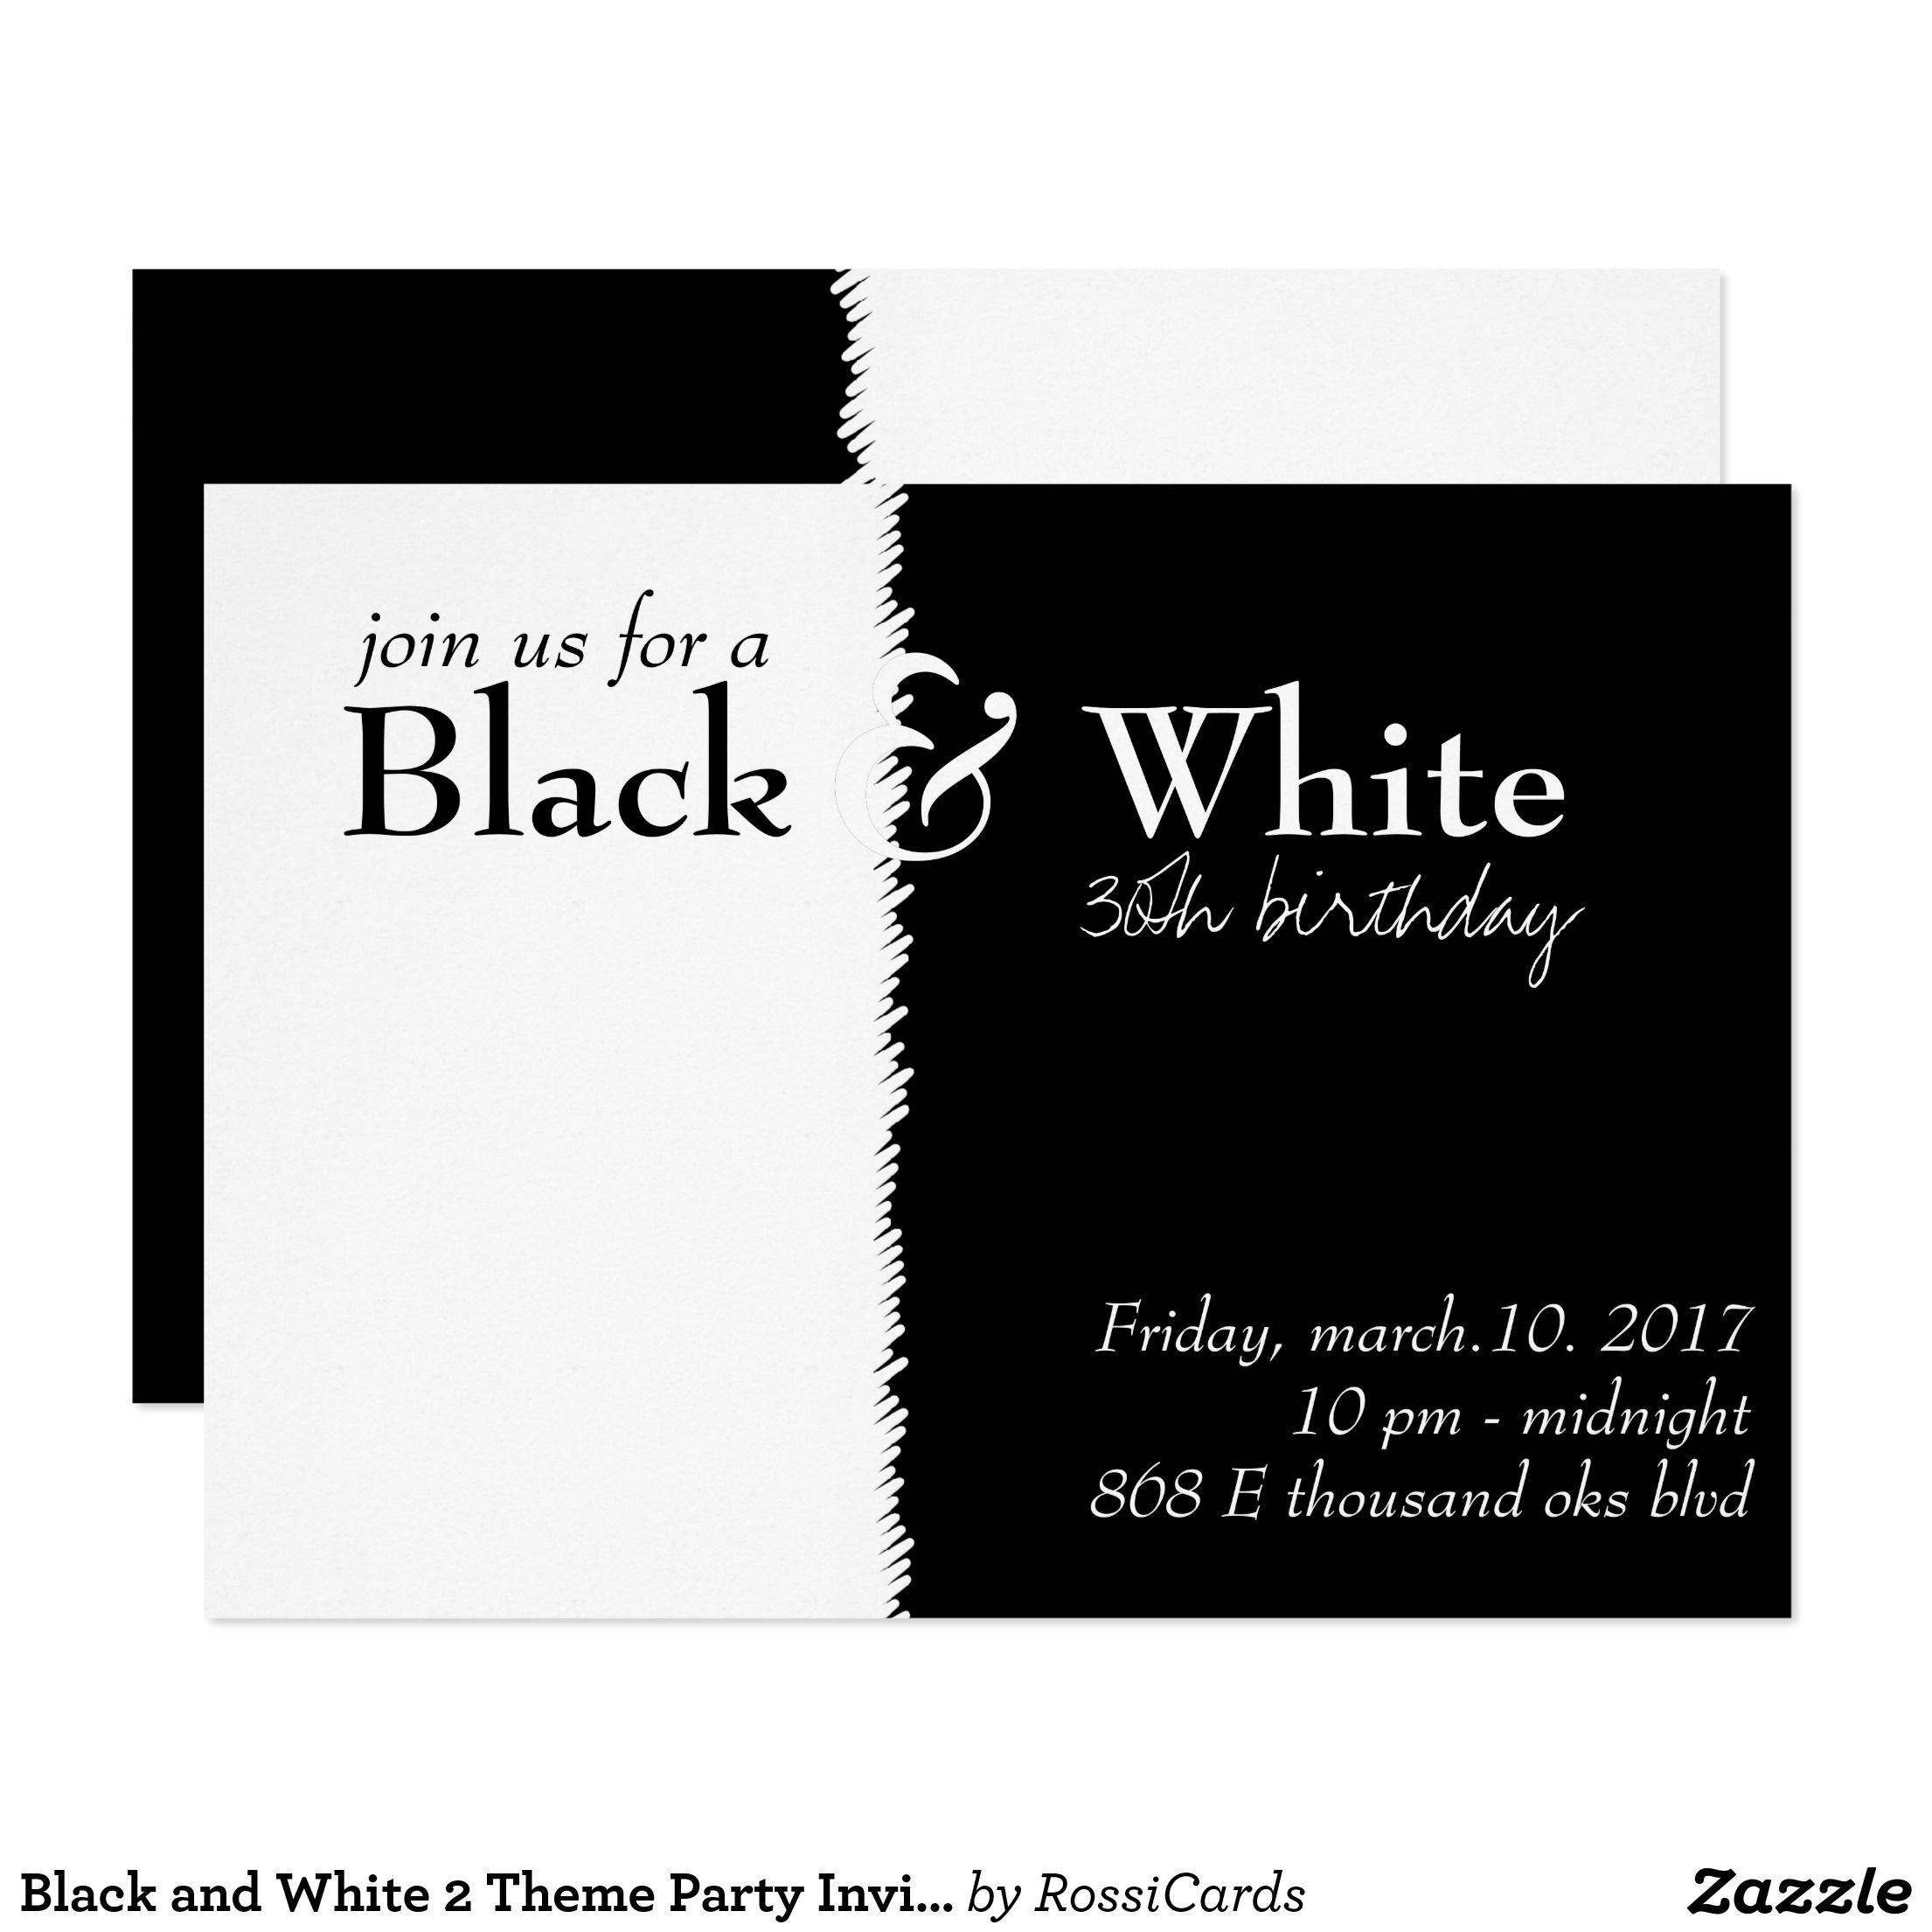 Black and White 2 Theme Party Invitation